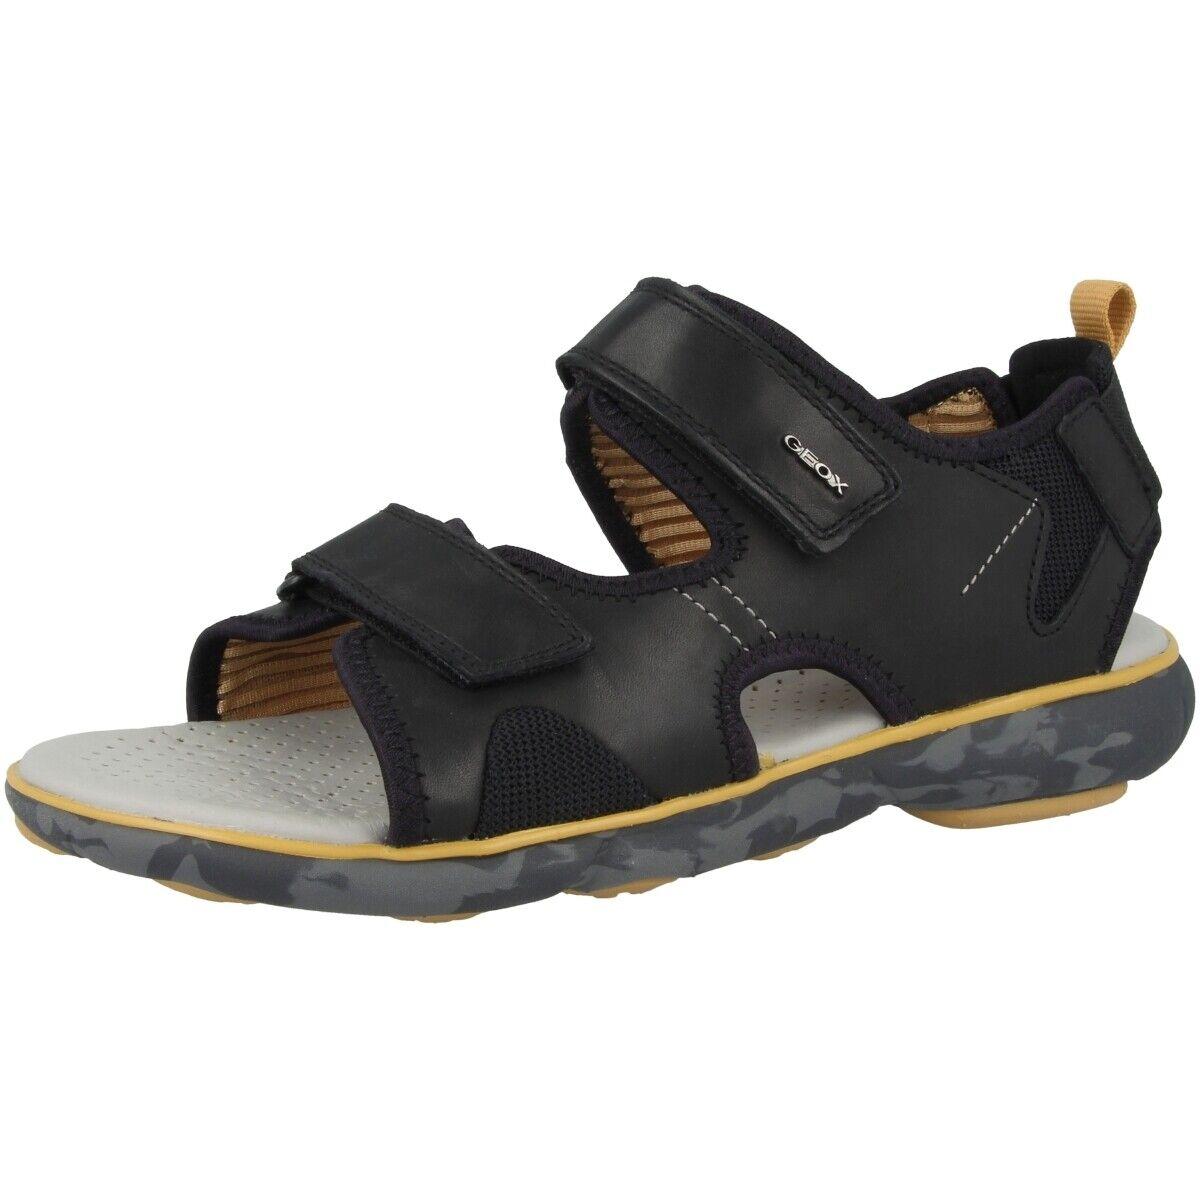 Geox u Nebula L B Zapatos Hombre Sandalias negro U926wb00043c9999